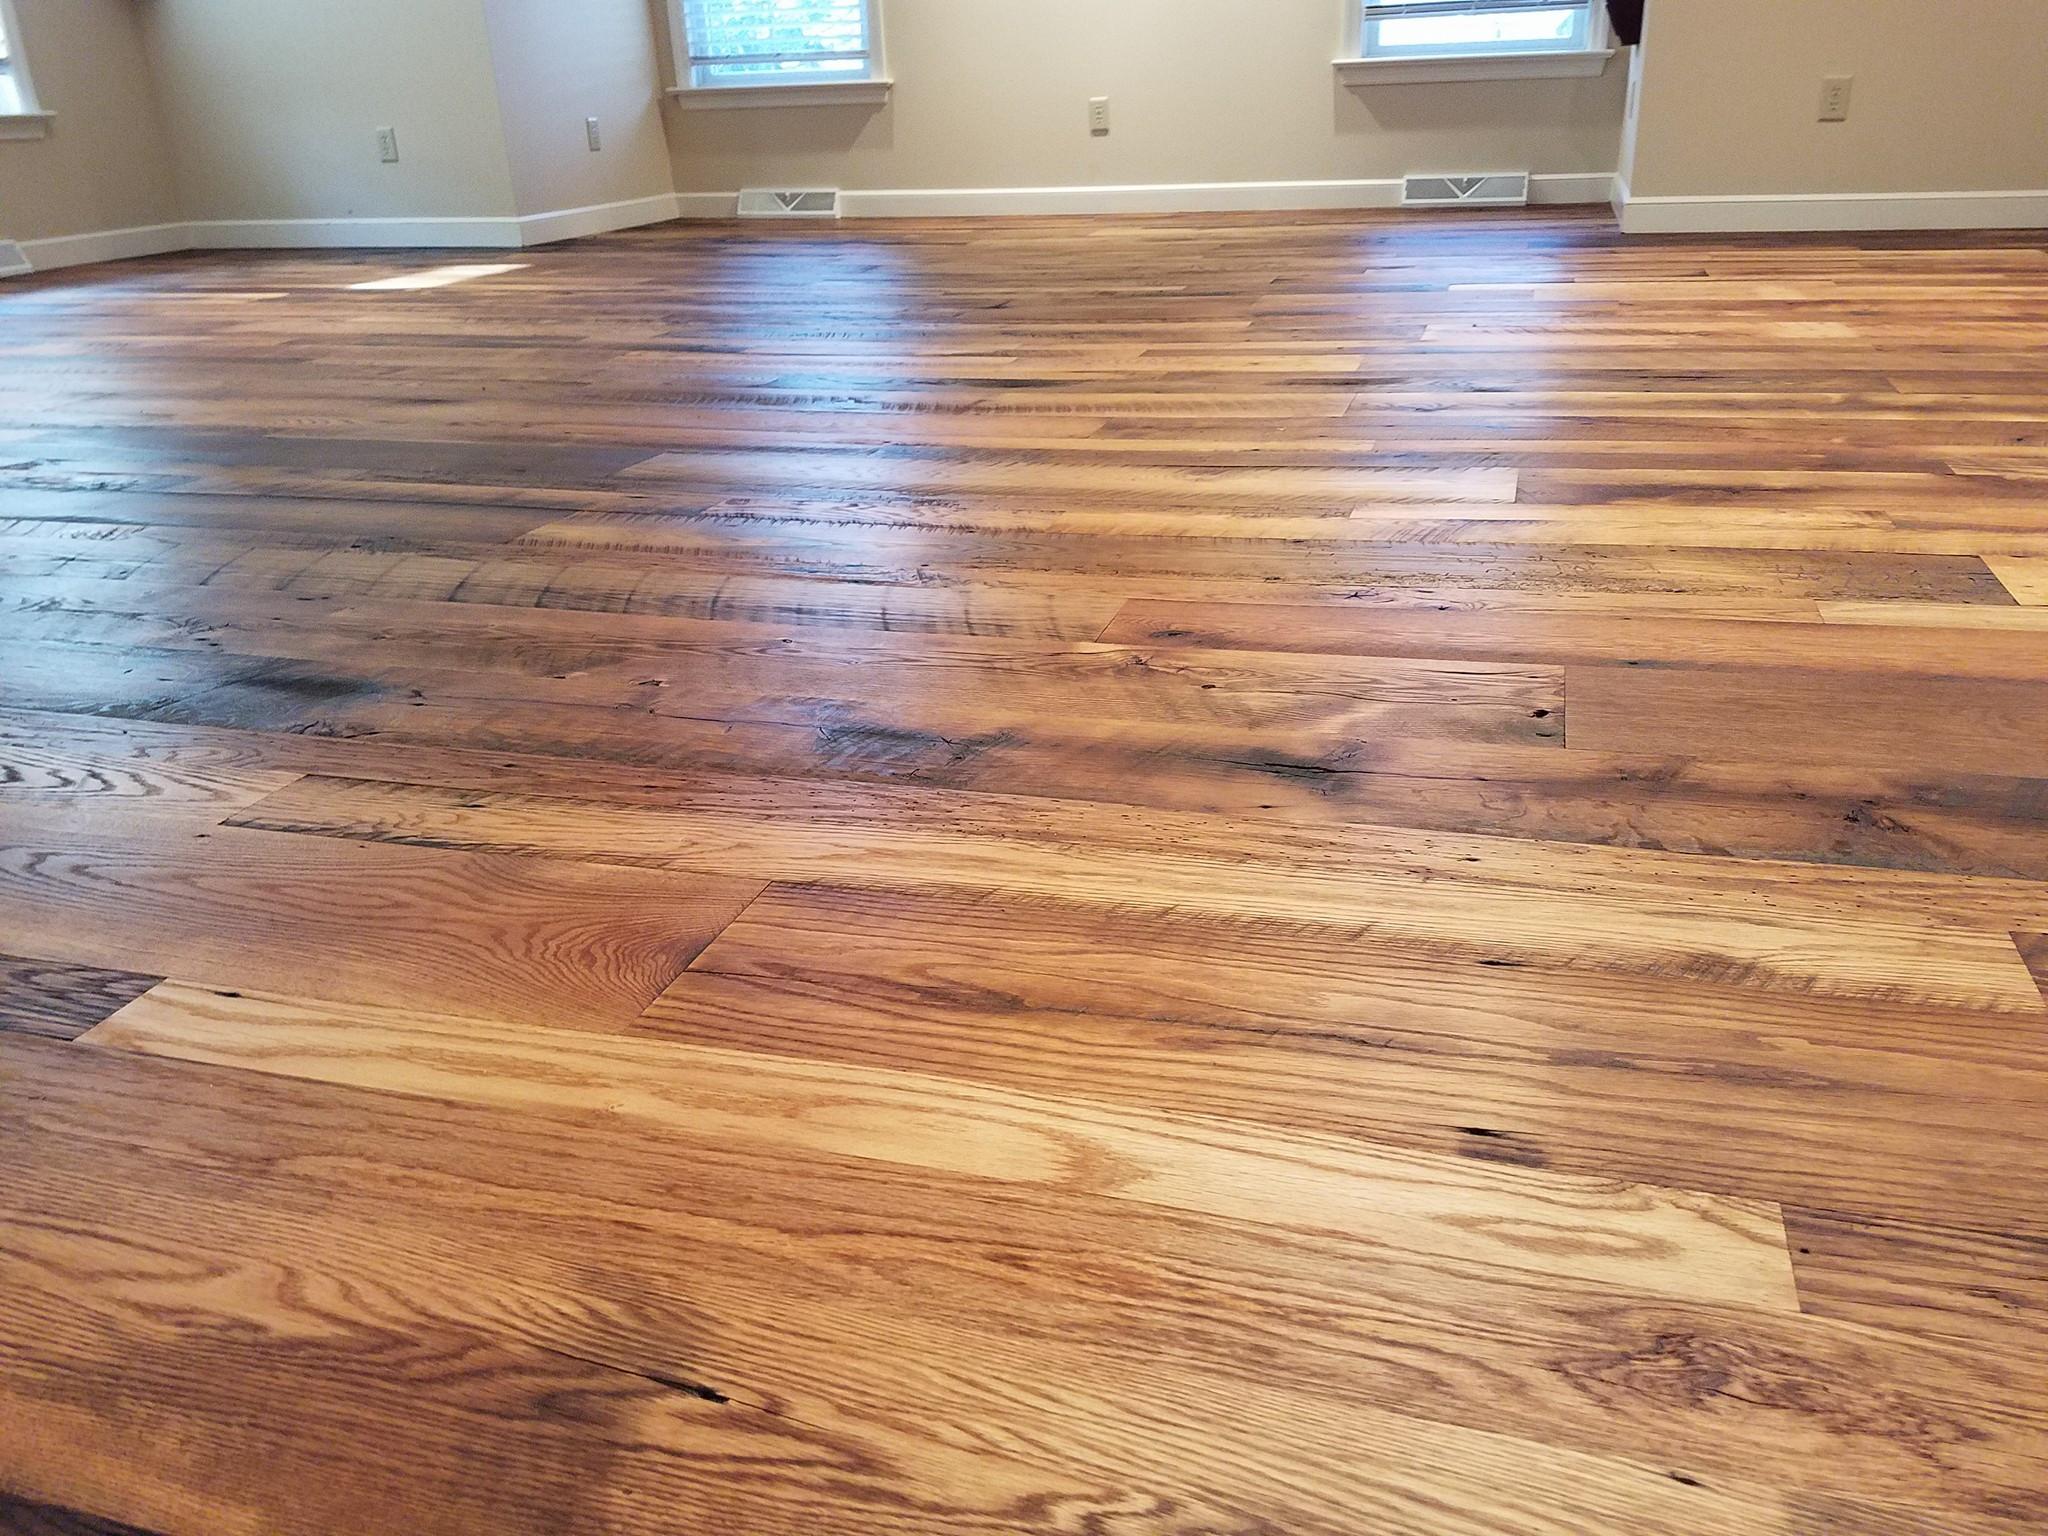 cost to restore hardwood floors of vintage wood flooring pertaining to 15540630 1468260353201806 4284335561504308085 o